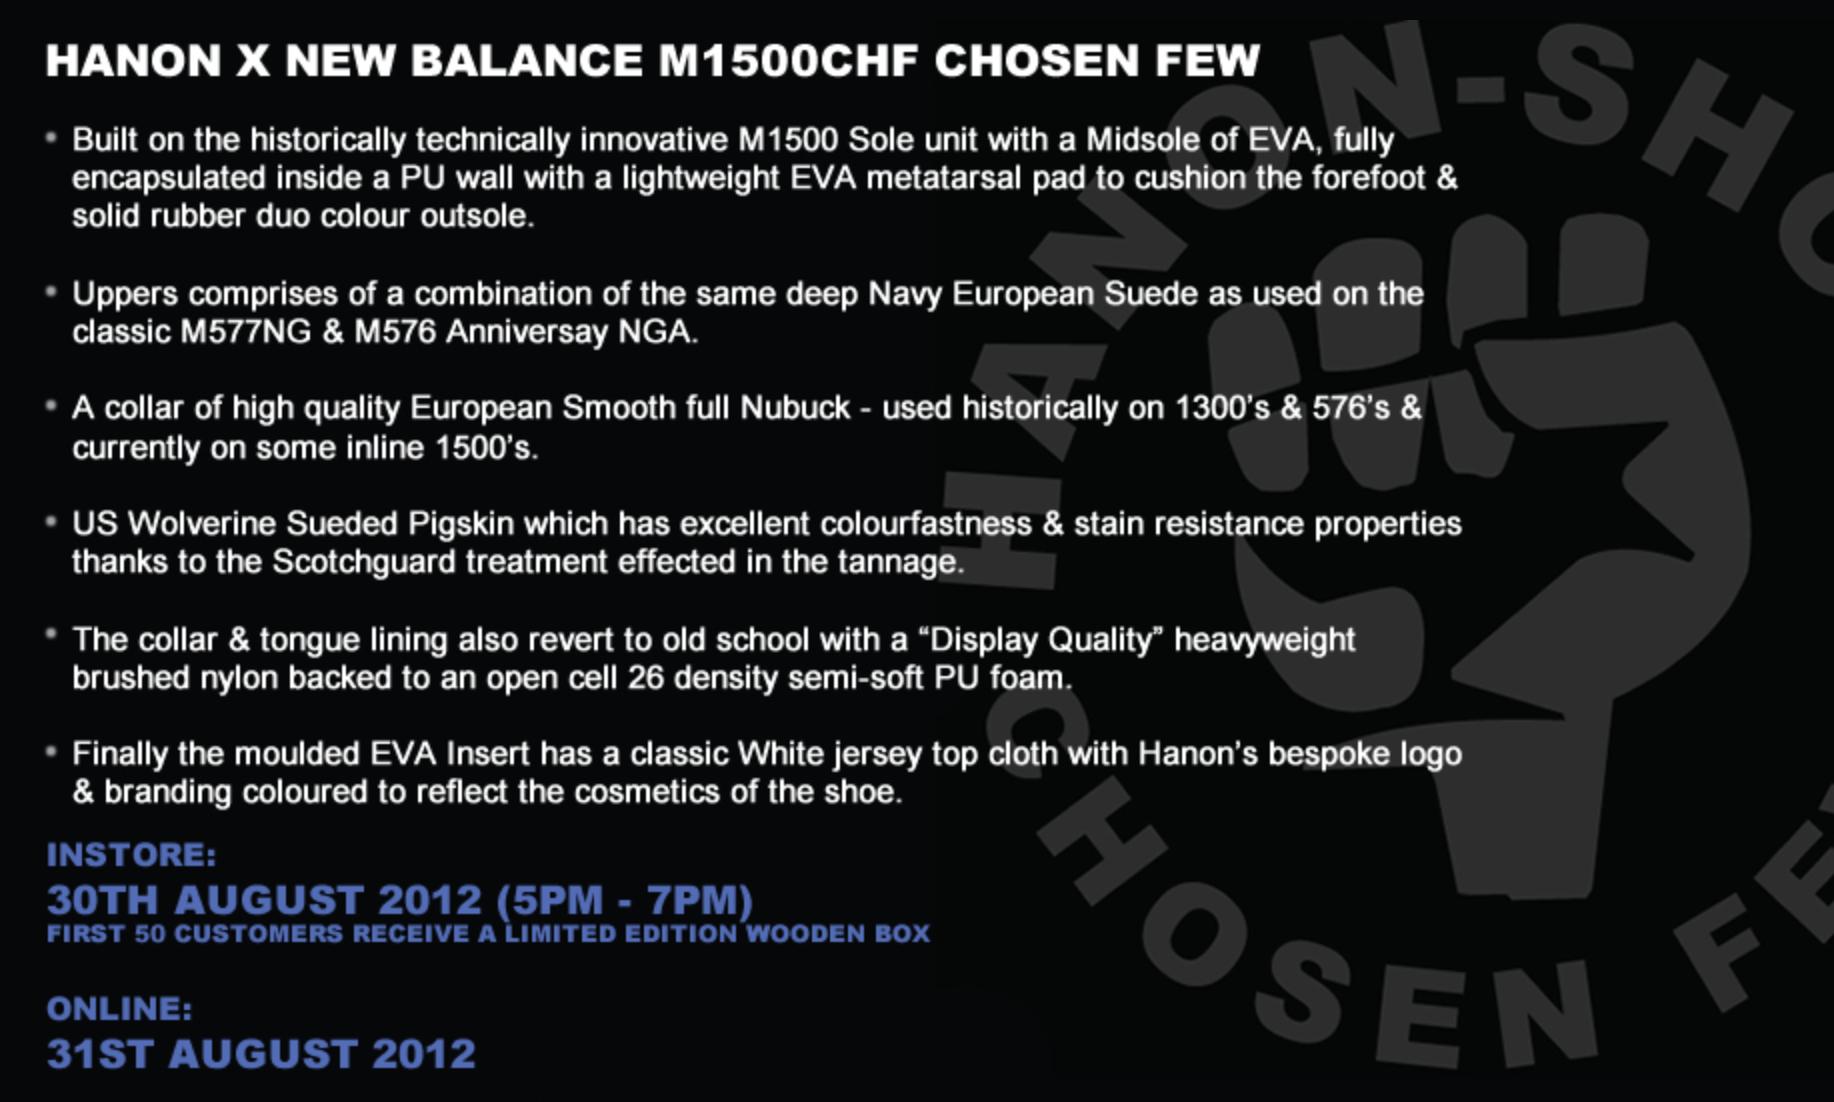 Hanon x New Balance 1500 'Chosen Few' - New Images